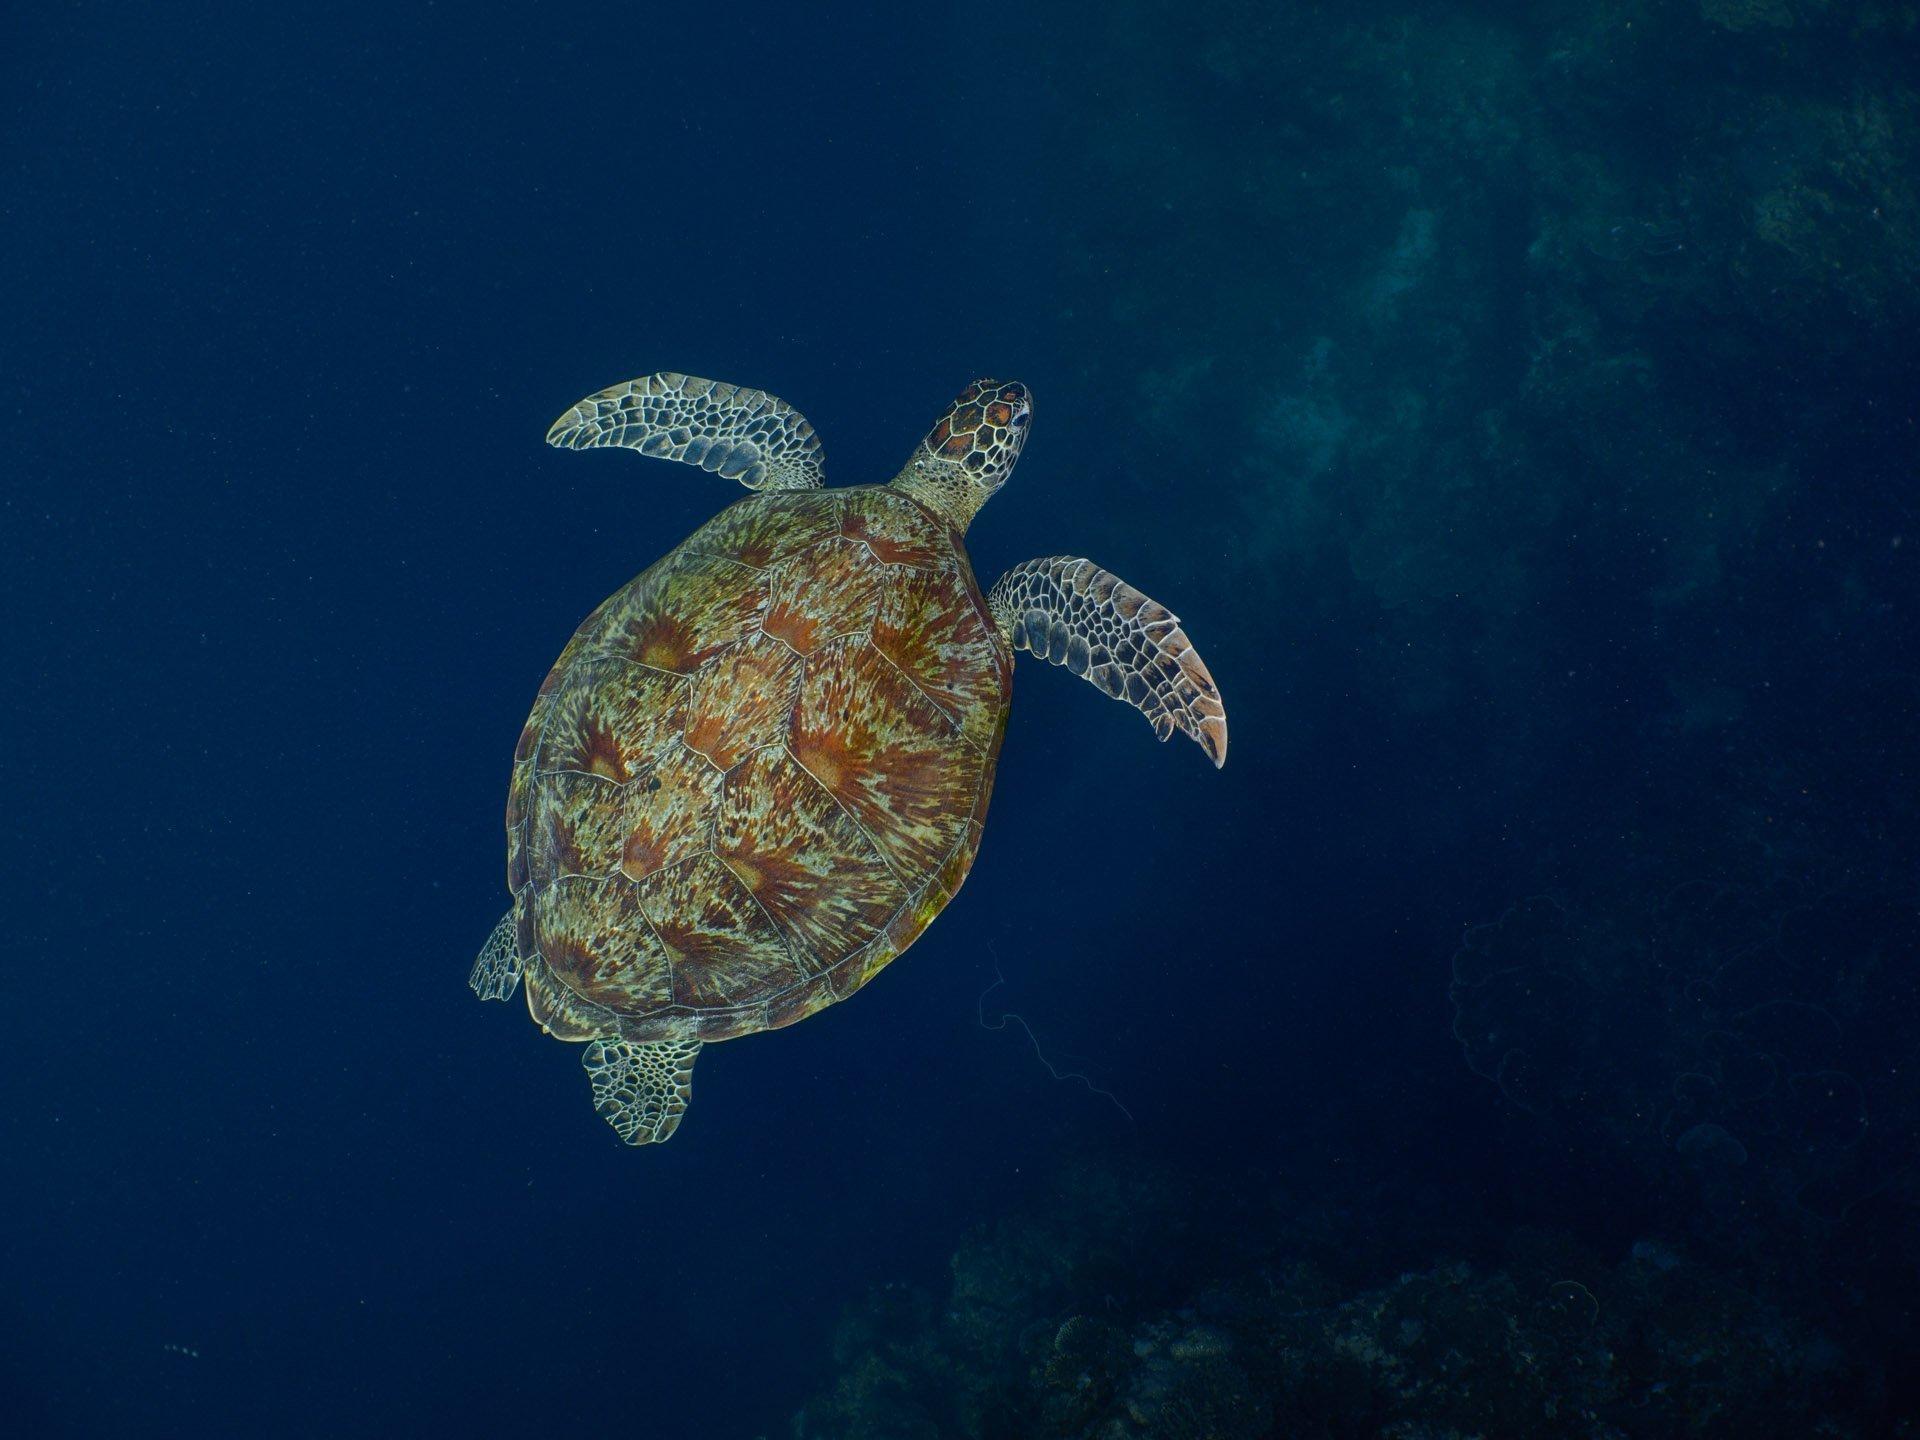 Green sea turtle swimming over deep blue water